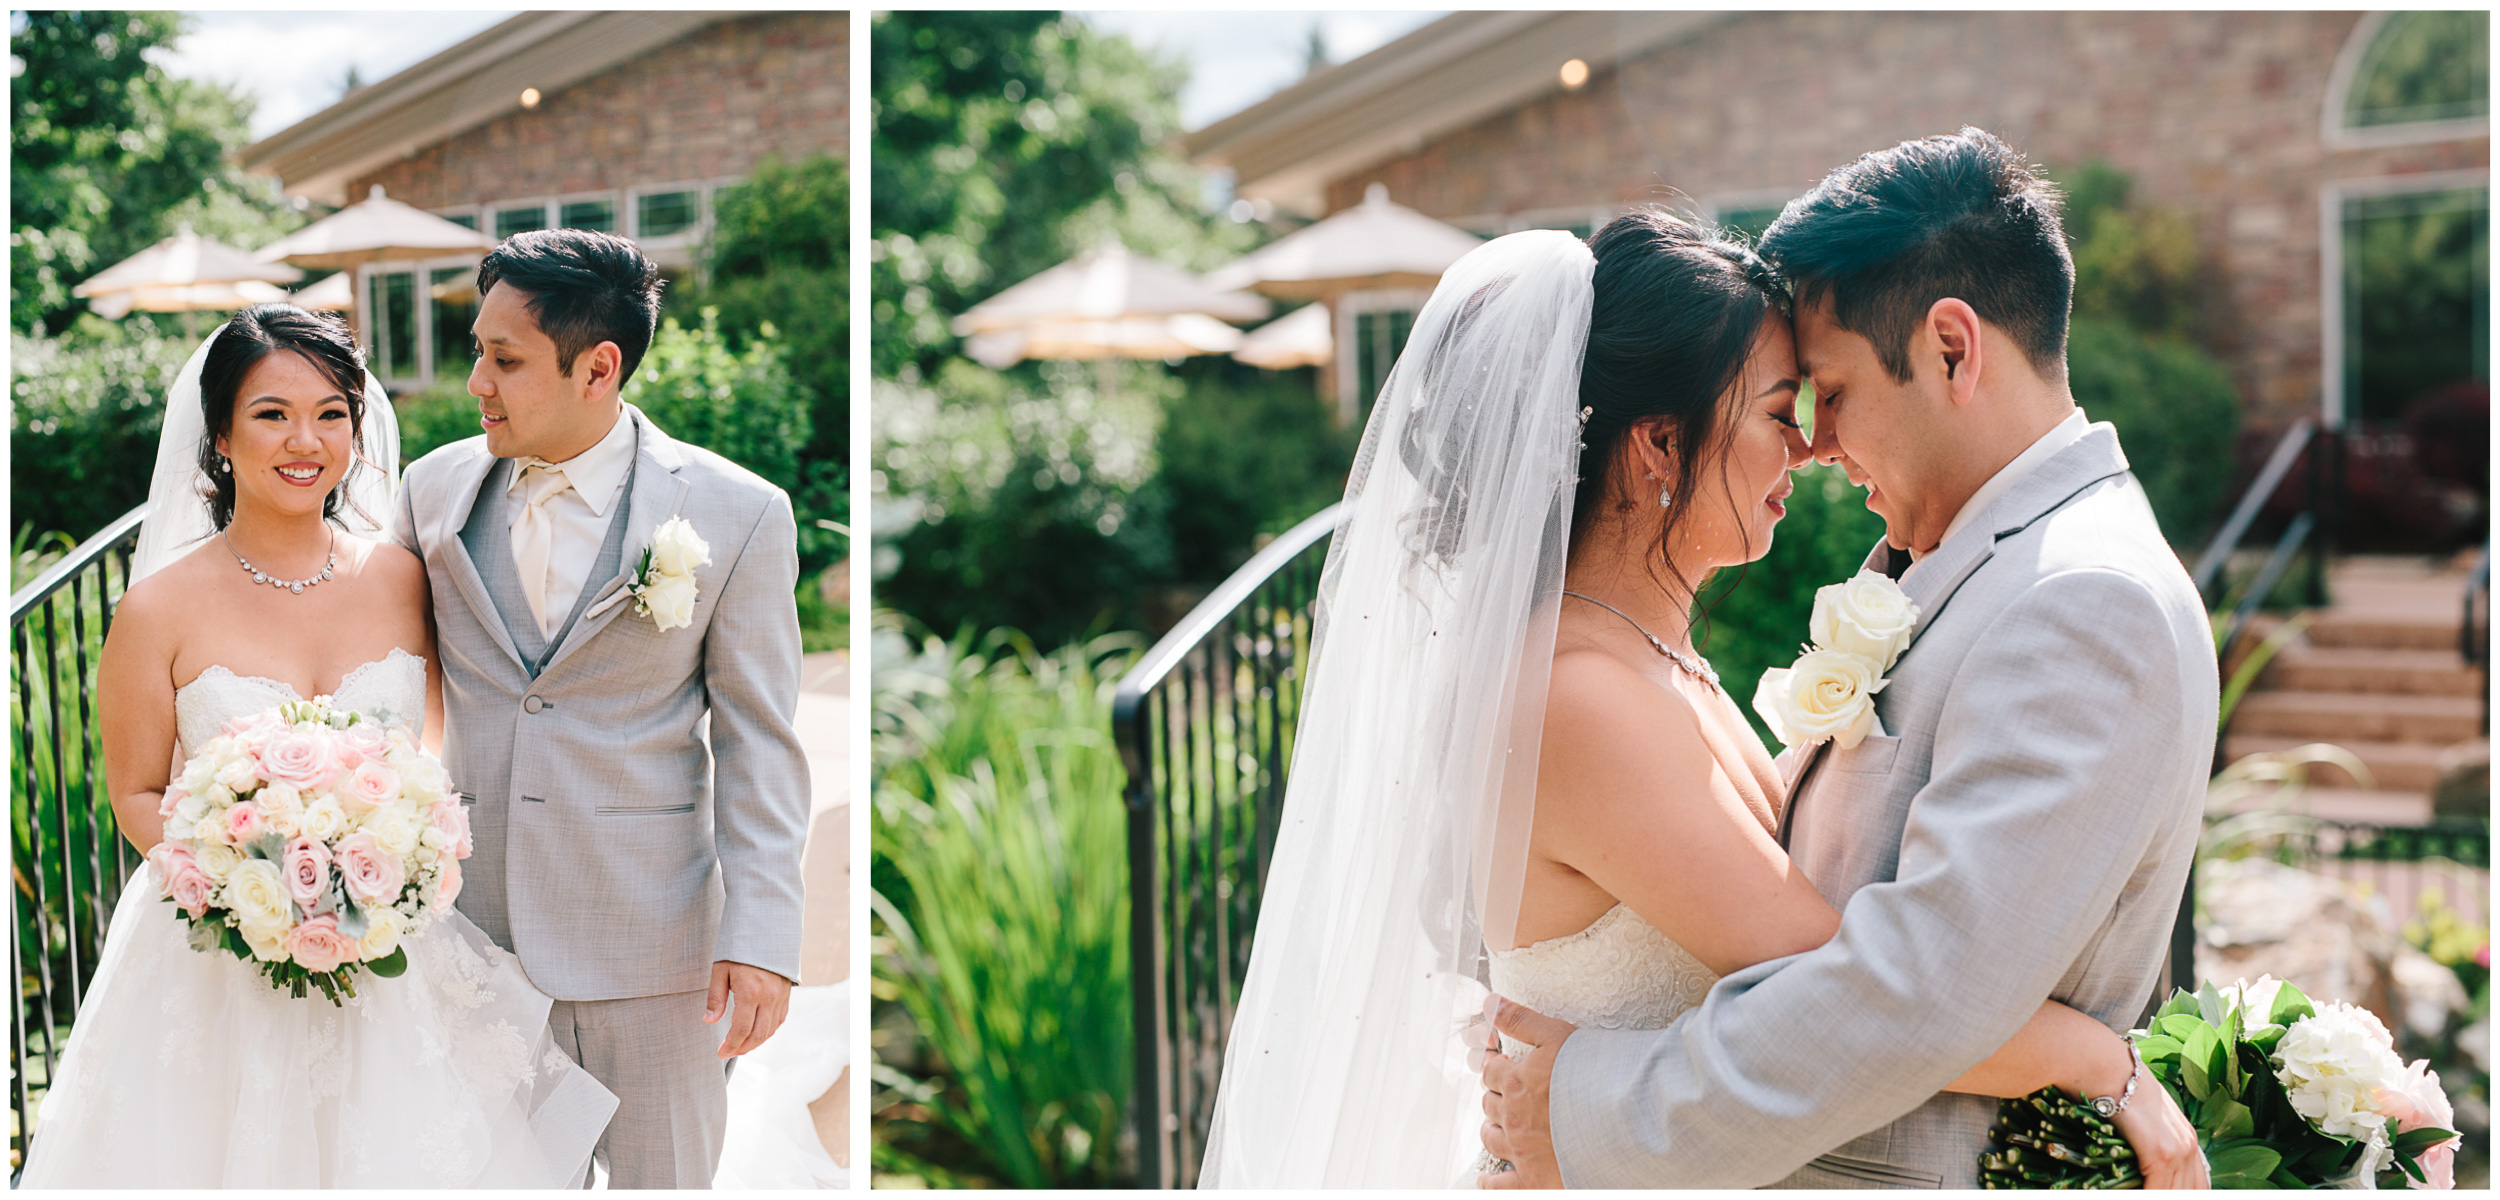 stonebrook_manor_wedding_18.jpg